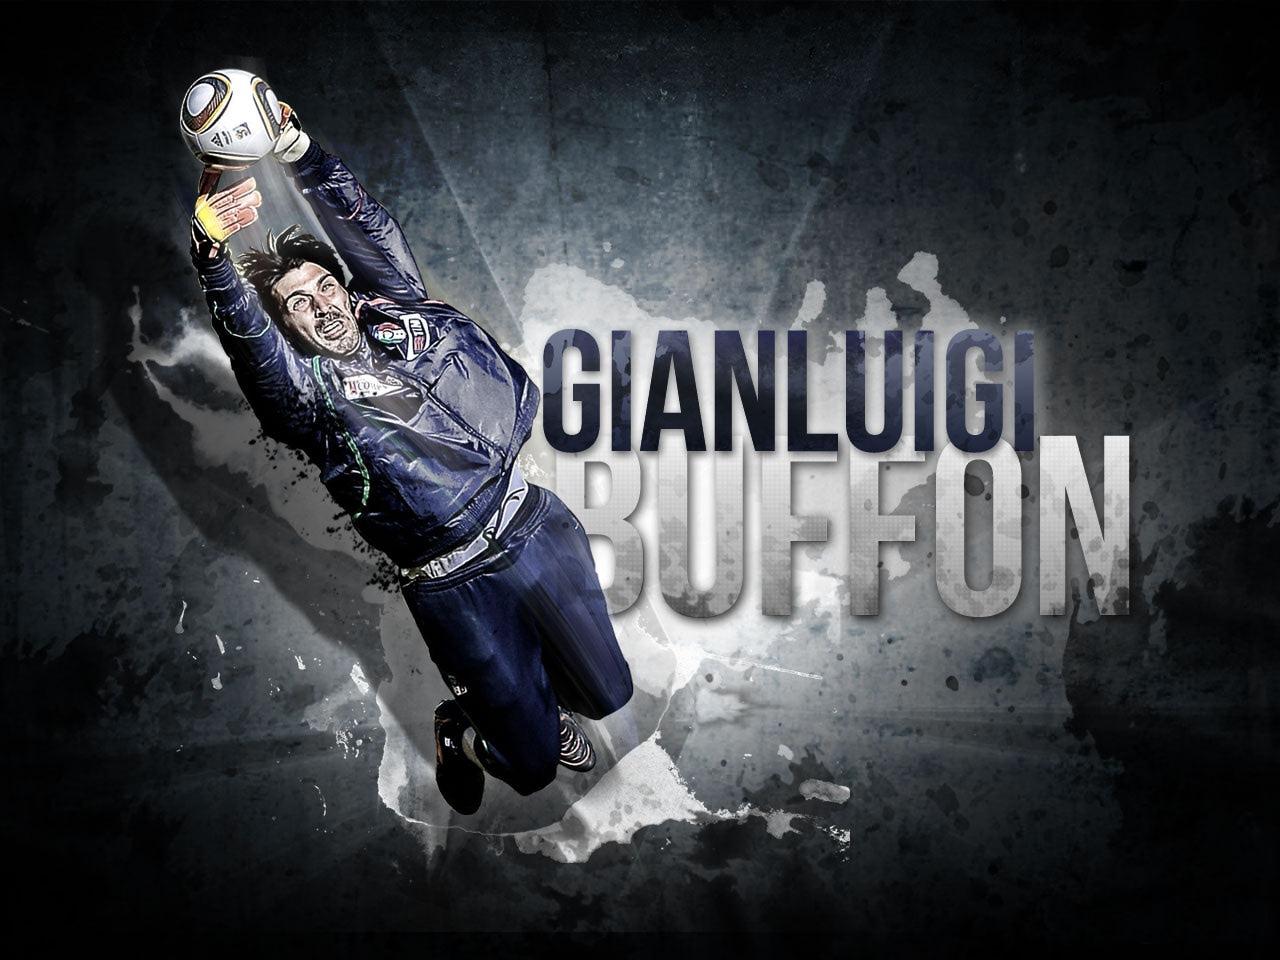 http://1.bp.blogspot.com/-hCfNhJCeeGs/T6jjaaG2OUI/AAAAAAAADQE/OjZMbsh594w/s1600/Gianluigi+Buffon+2012+Hd+wallpapers+03.jpg